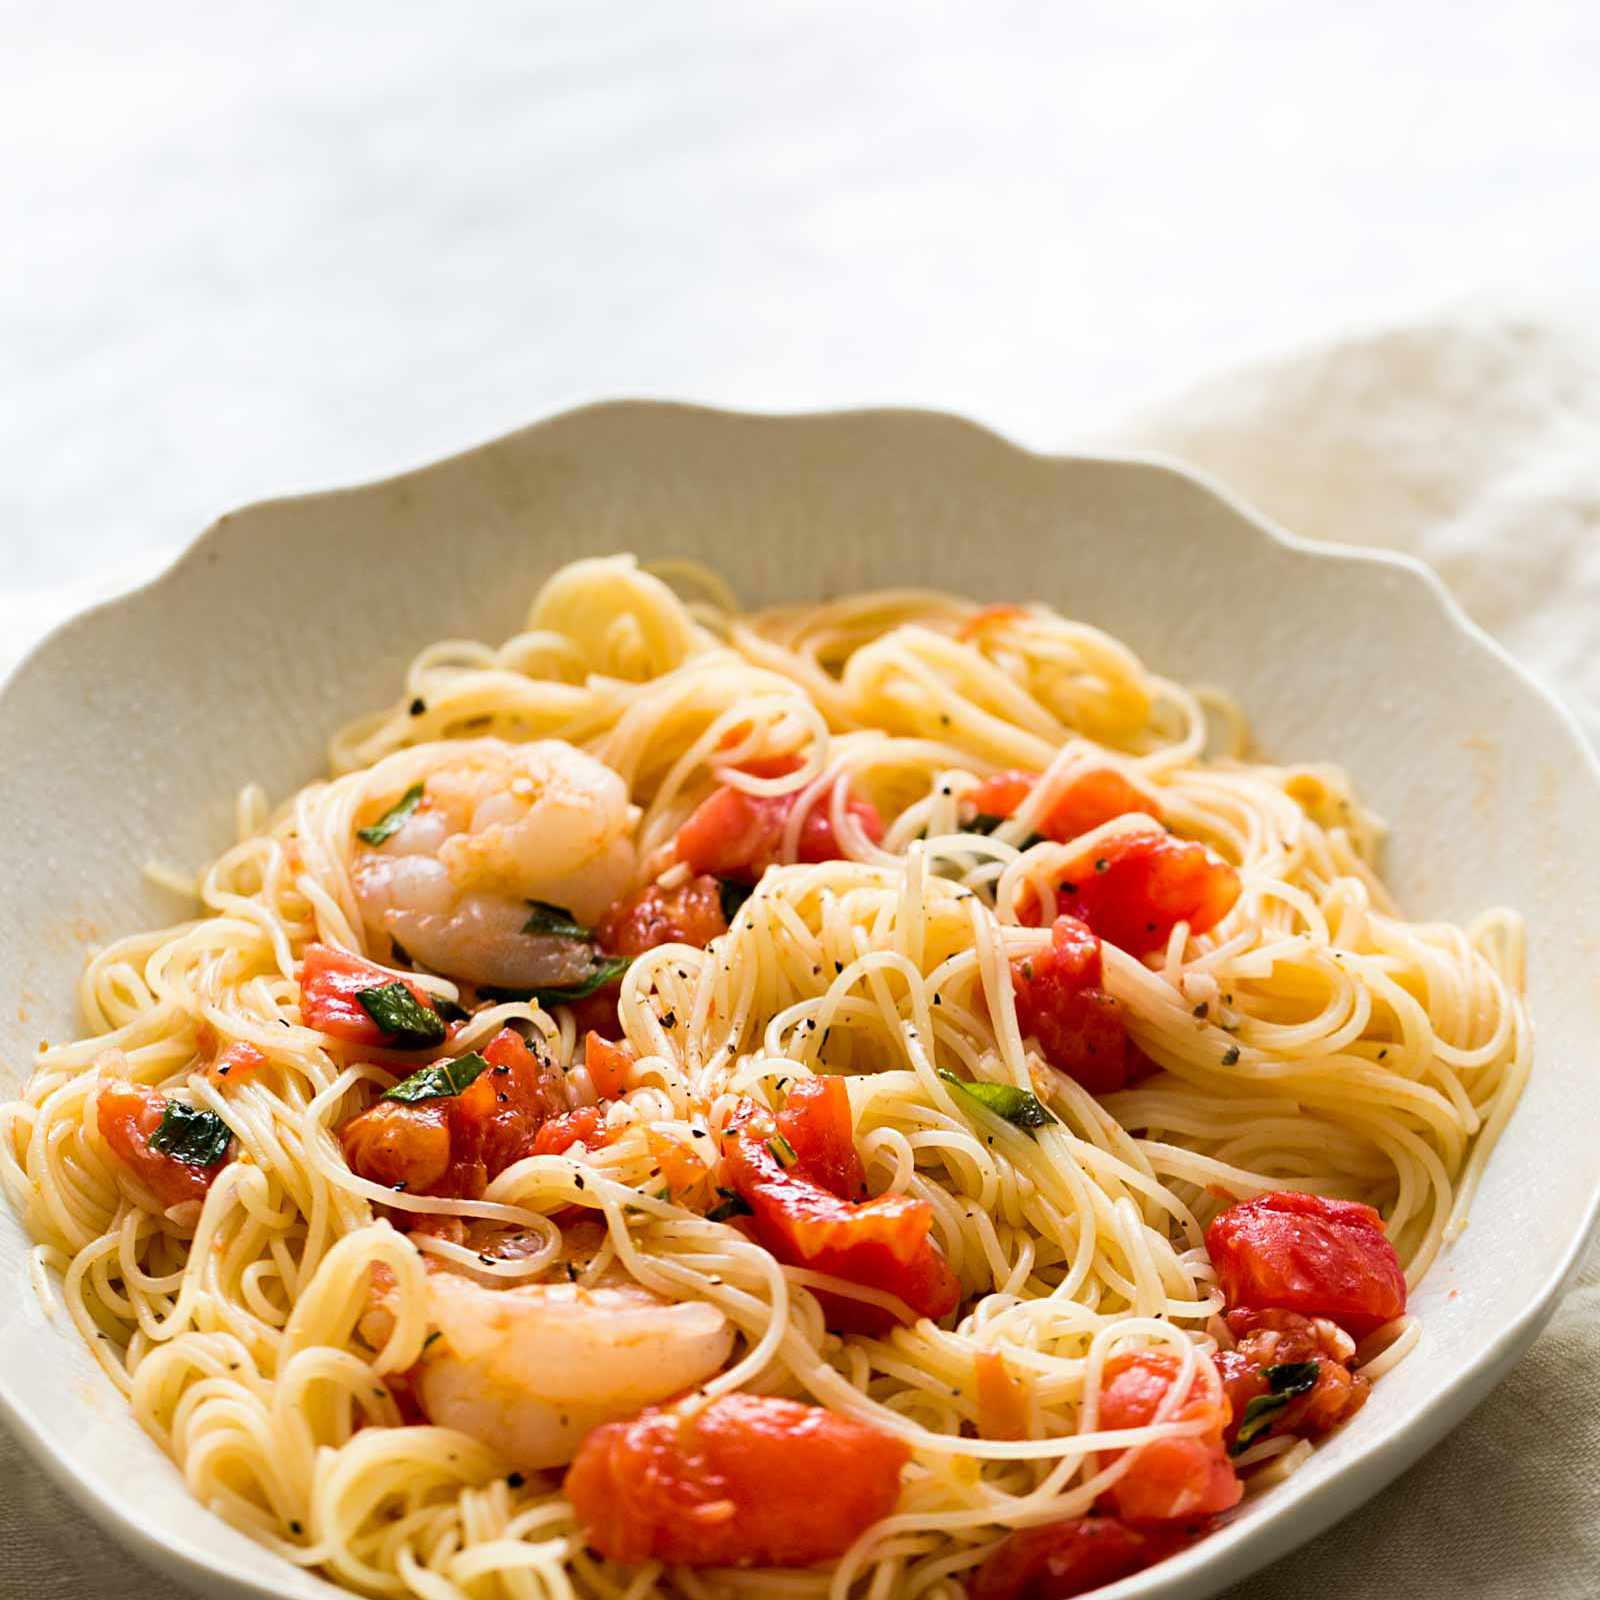 Pasta Pomodoro with Shrimp